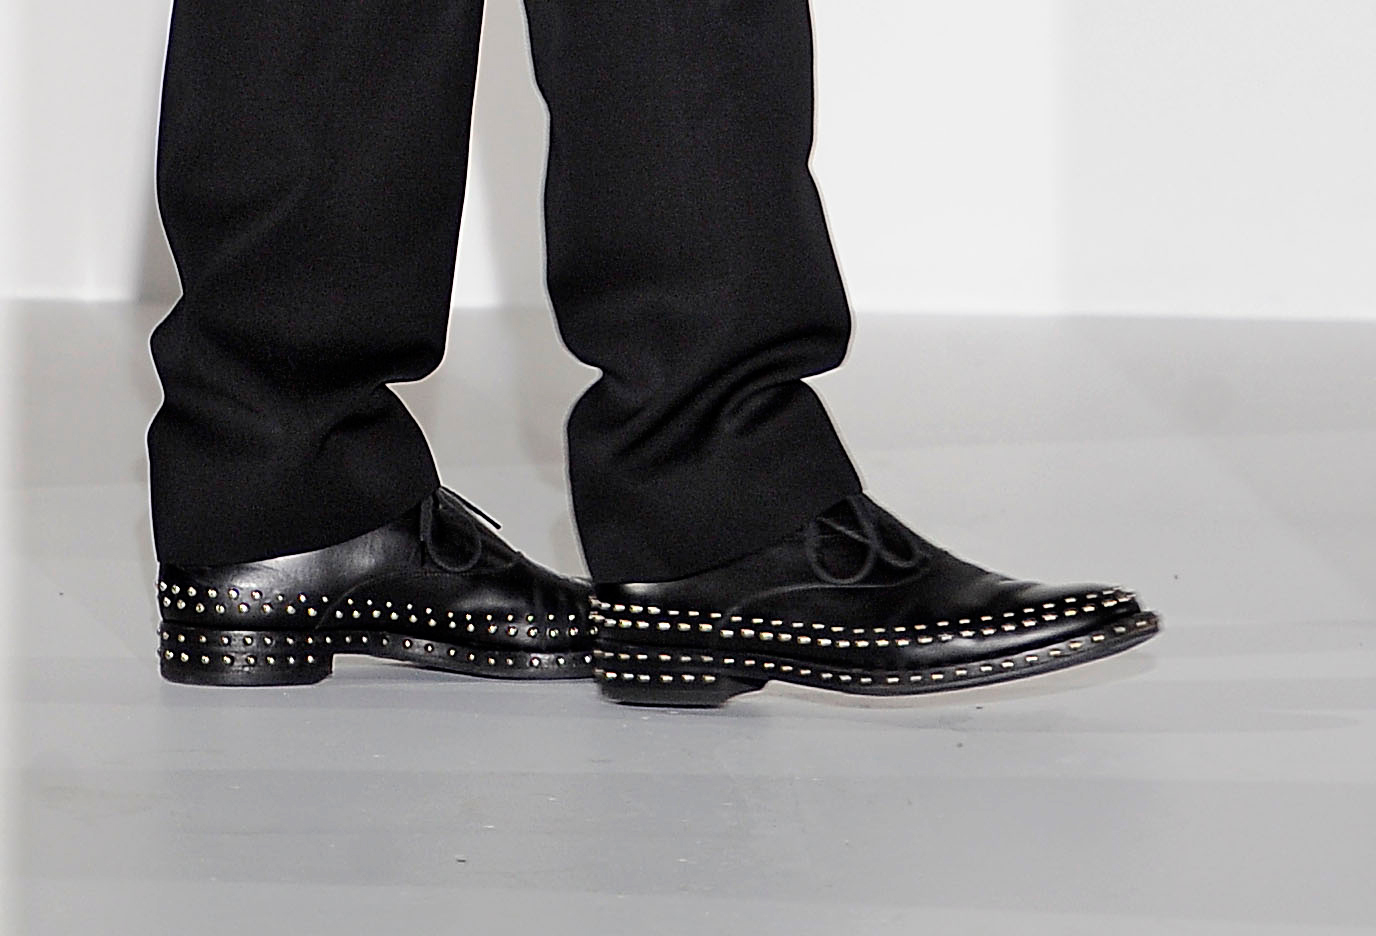 shoes_225.jpg